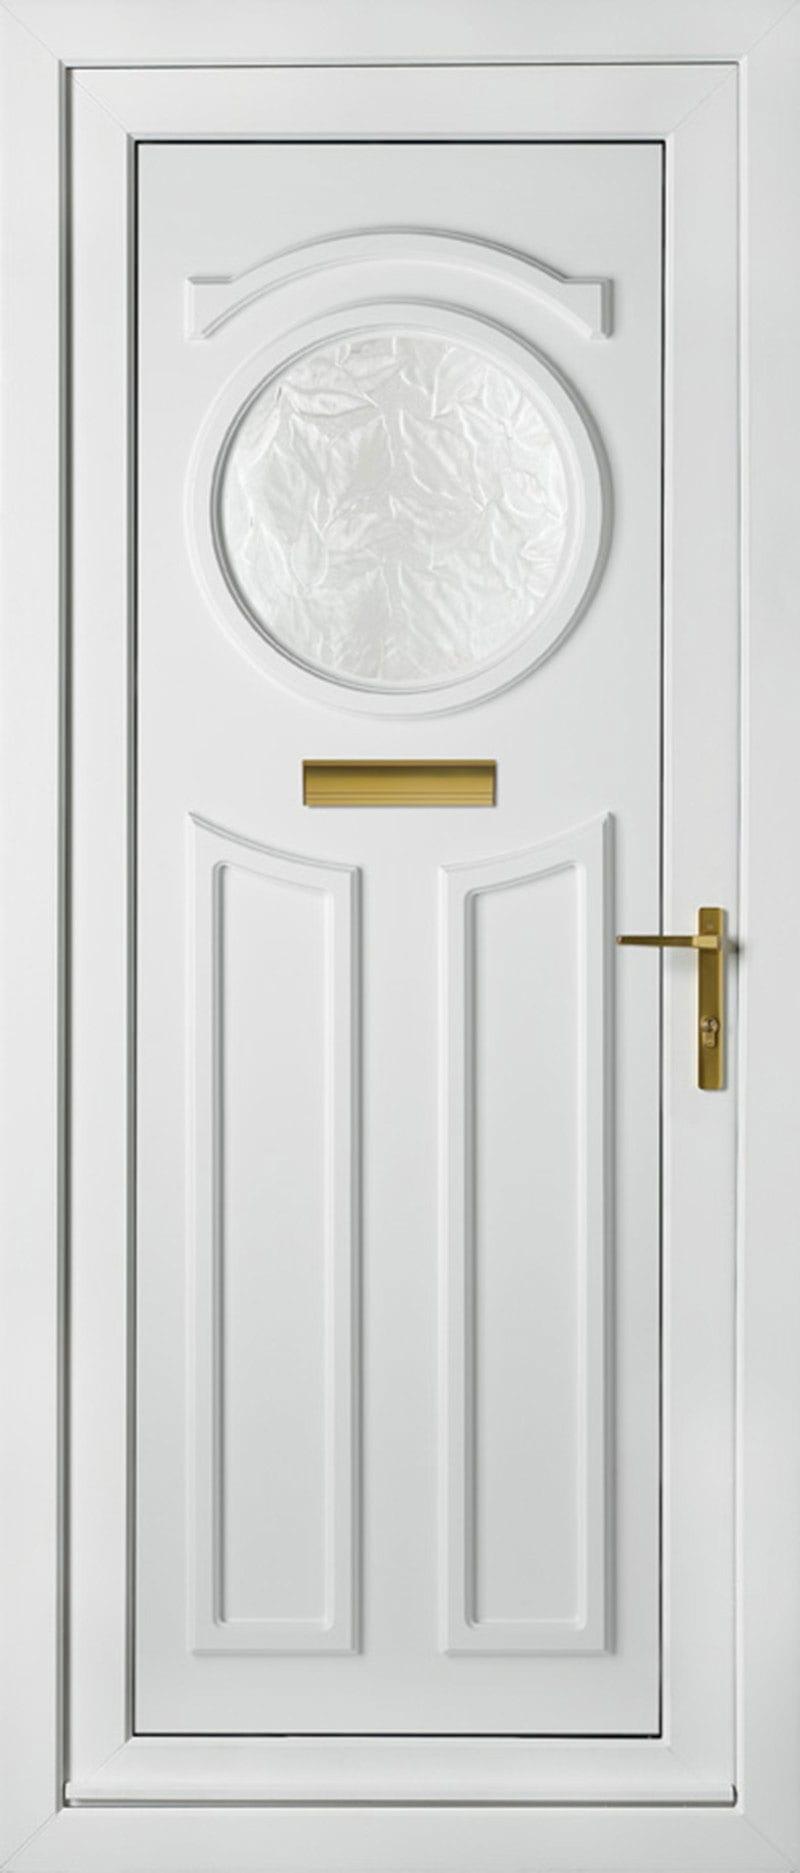 Pvc Panel Doors : Pvc doors and decorative panels dorset windows ltd